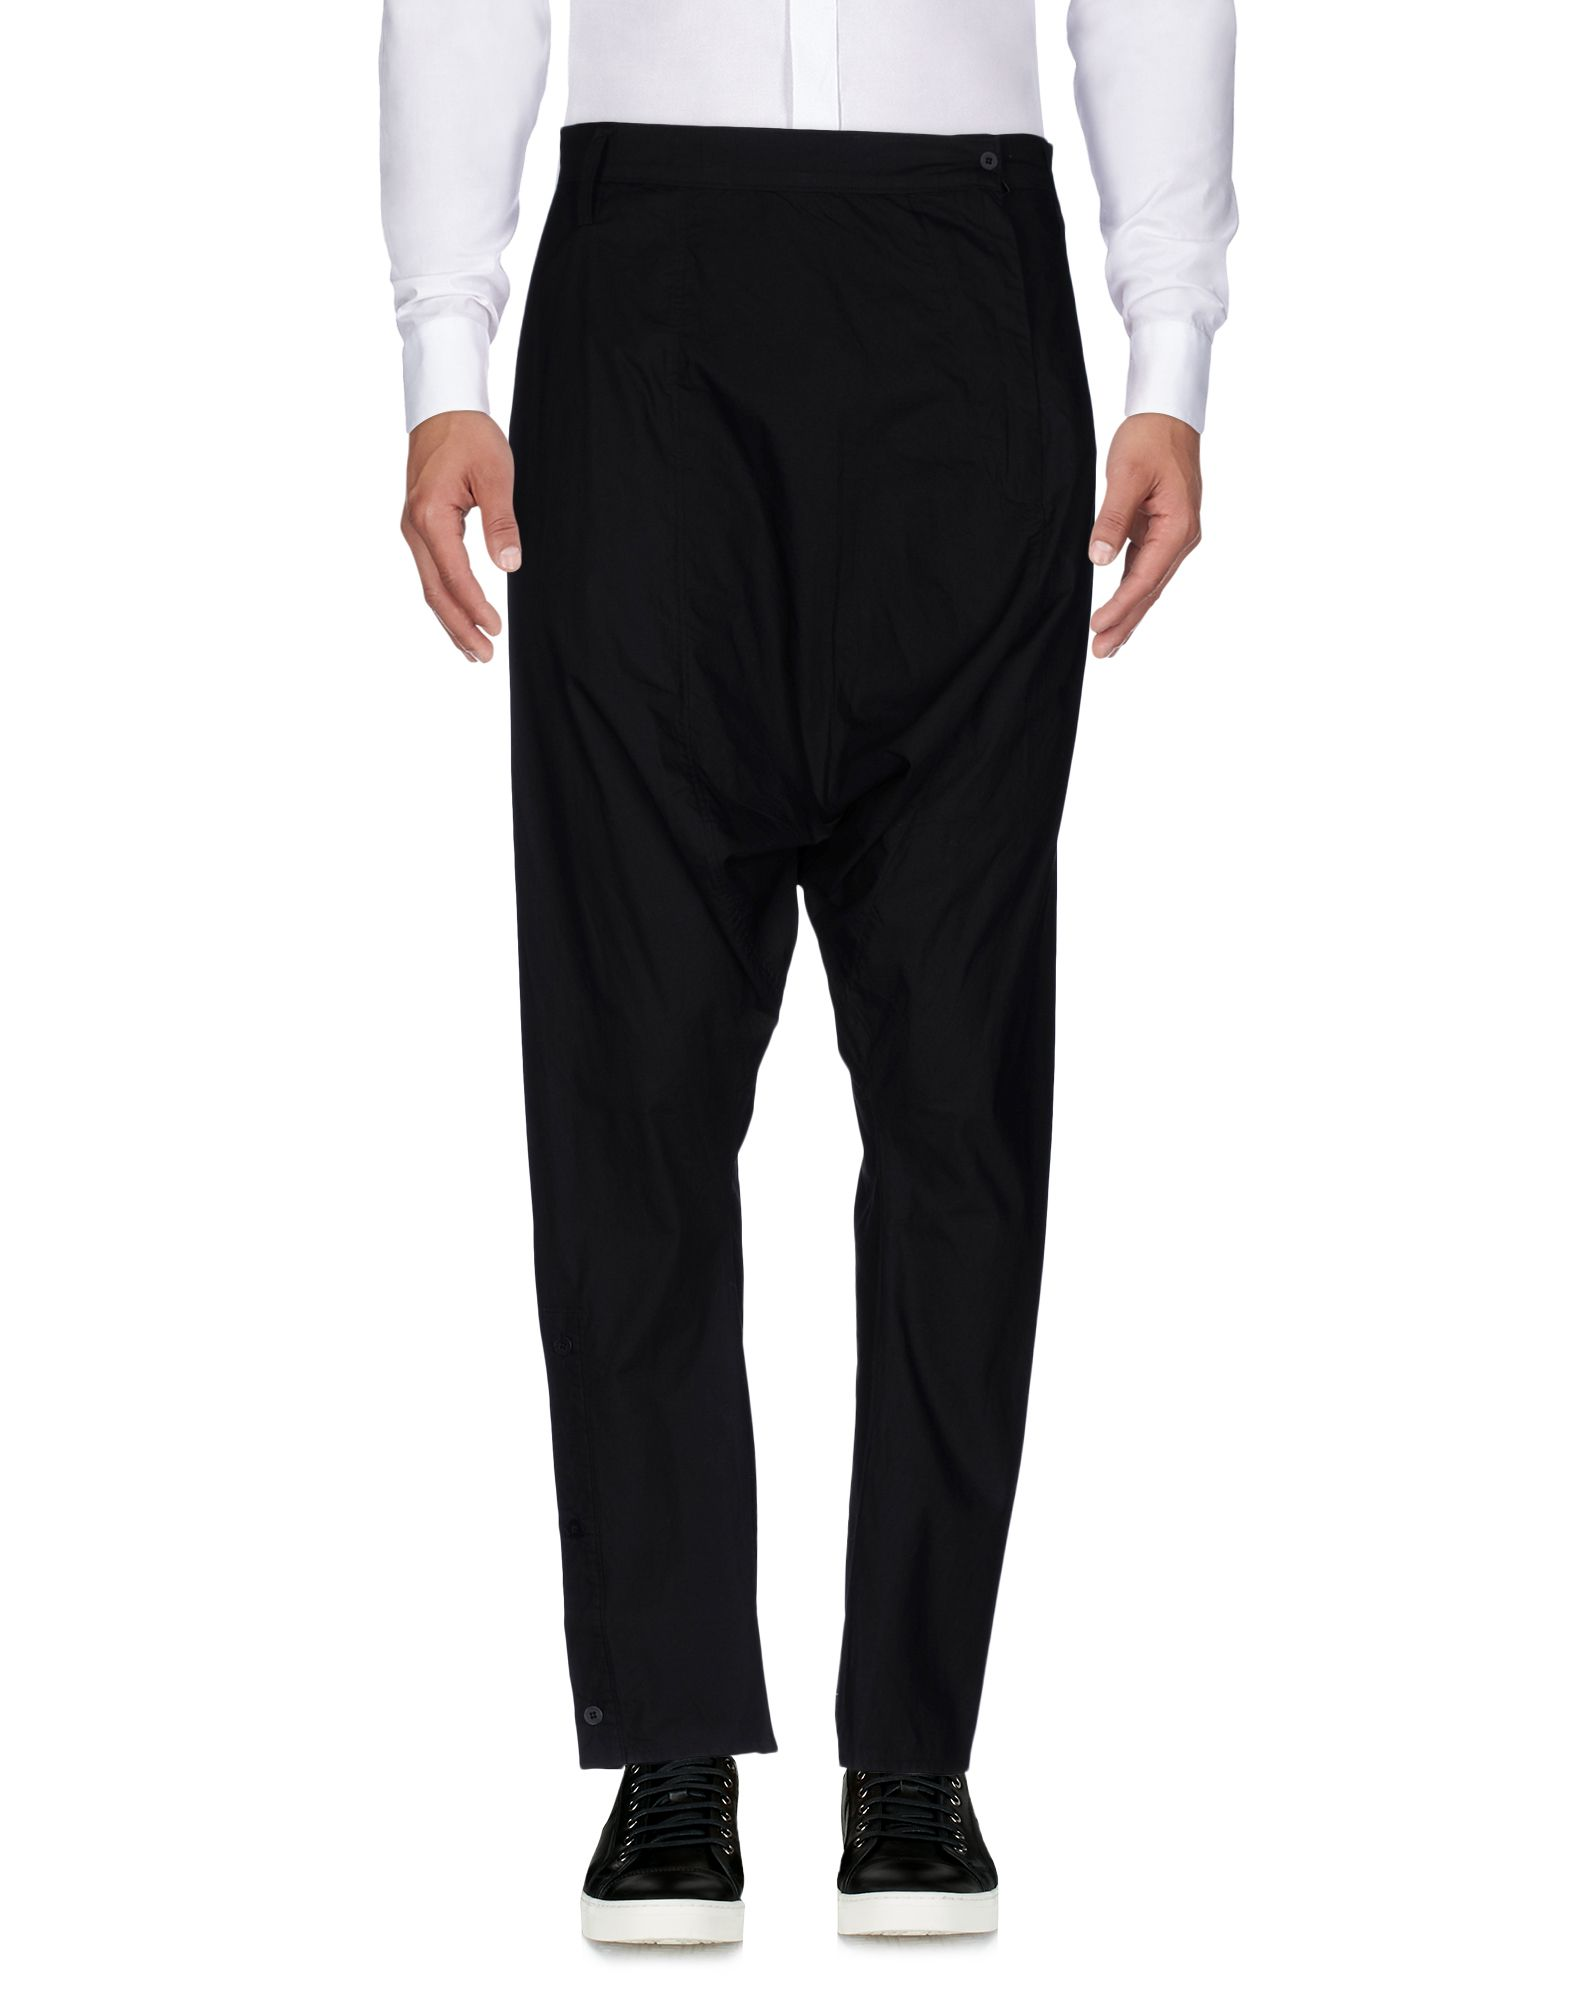 Pantalone Barbara I Gongini Donna - Acquista online su